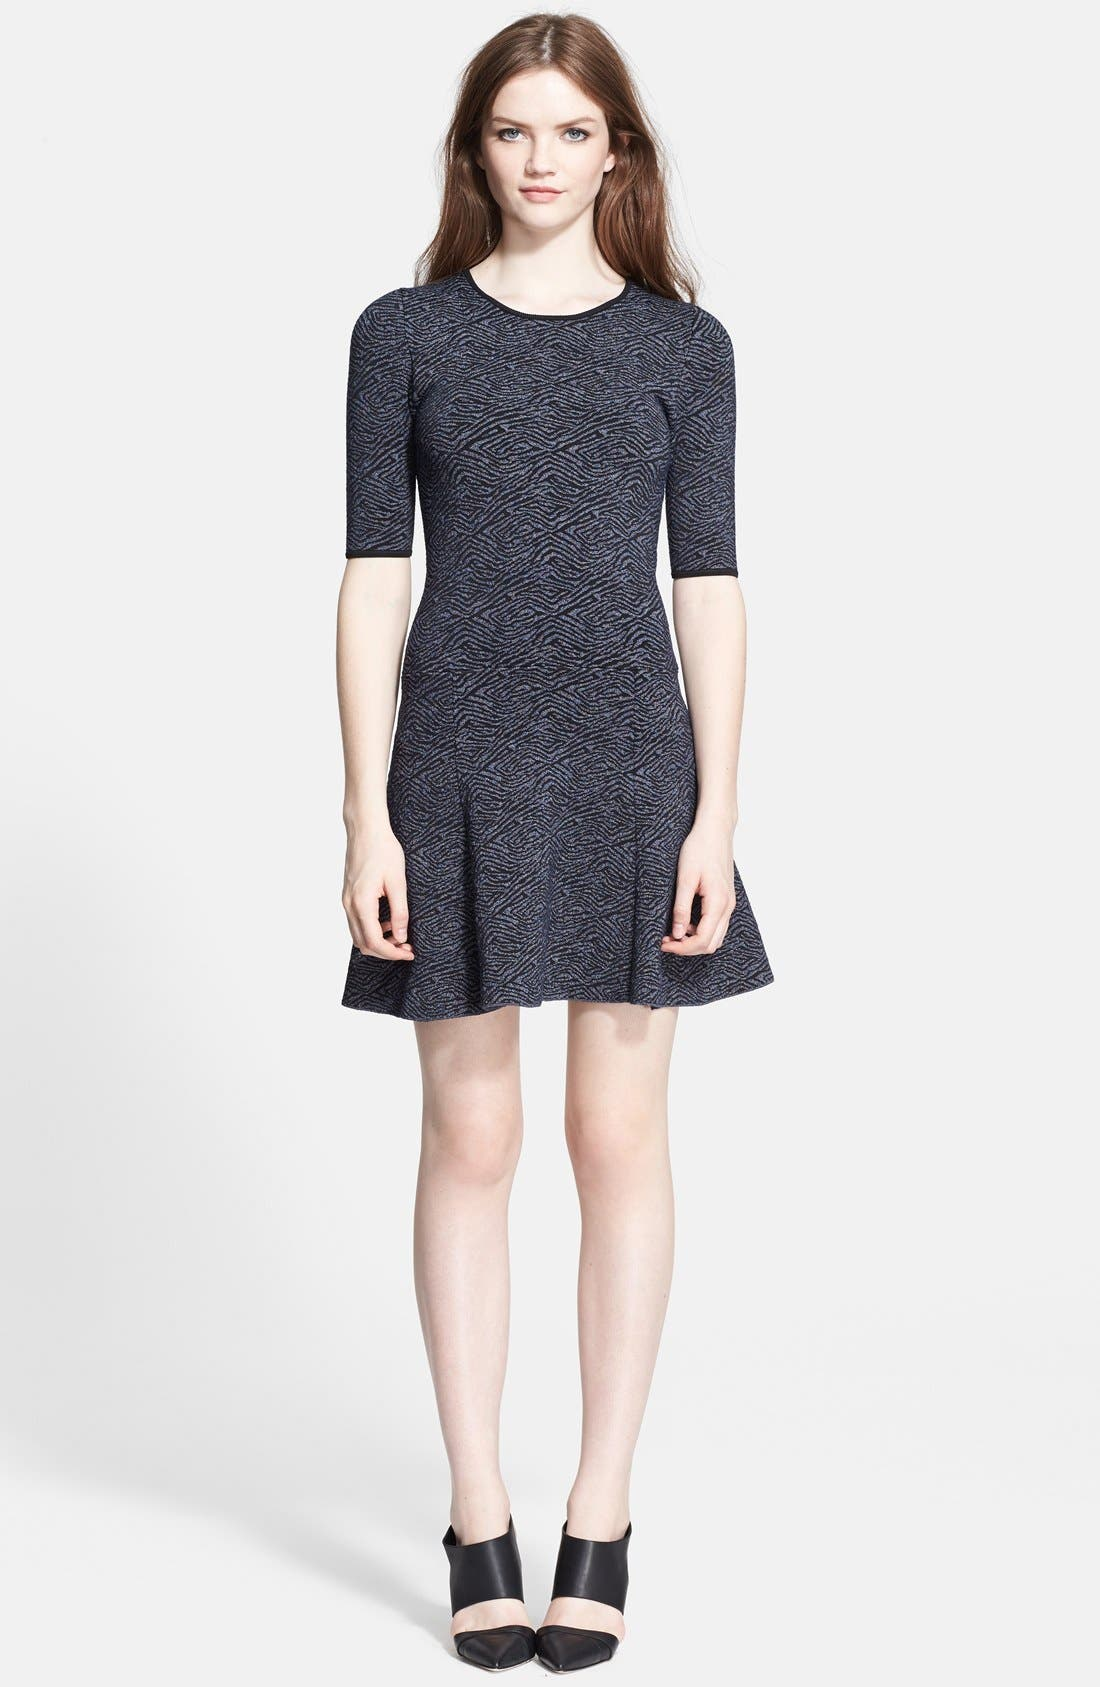 Alternate Image 1 Selected - A.L.C. 'Deele' Jacquard Knit Dress